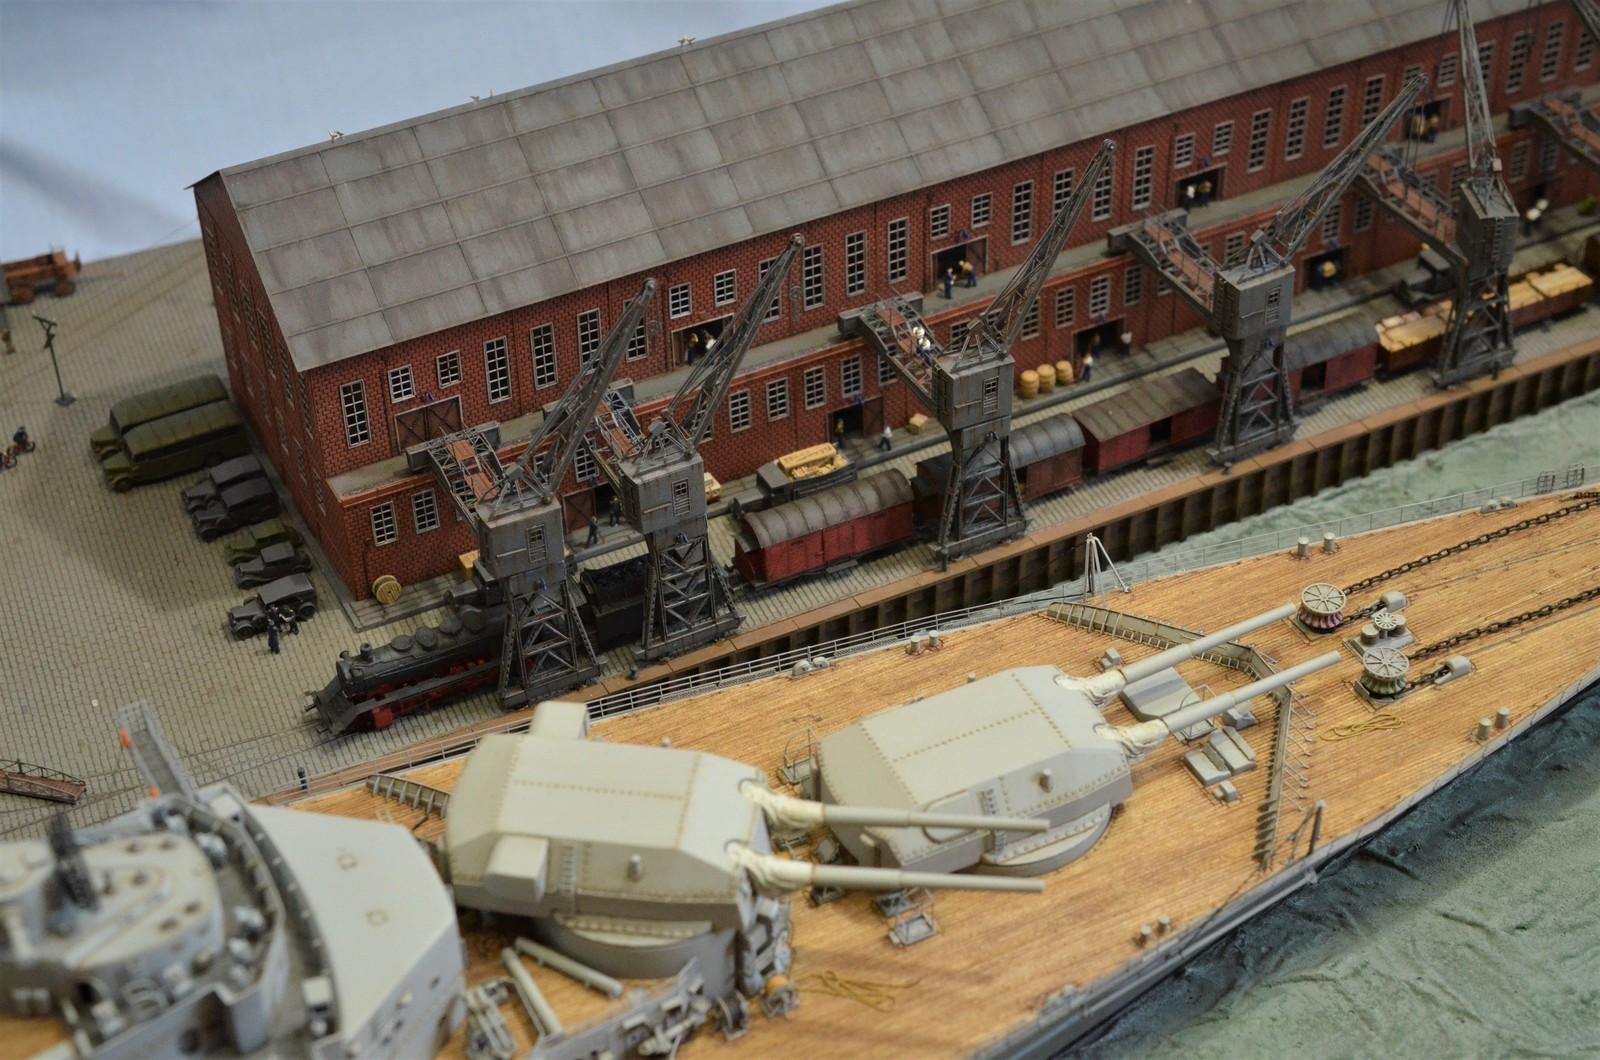 Grande grue 250 t port de Hambourg et Bismarck Revell au 1/350 - Page 11 IkmN2X